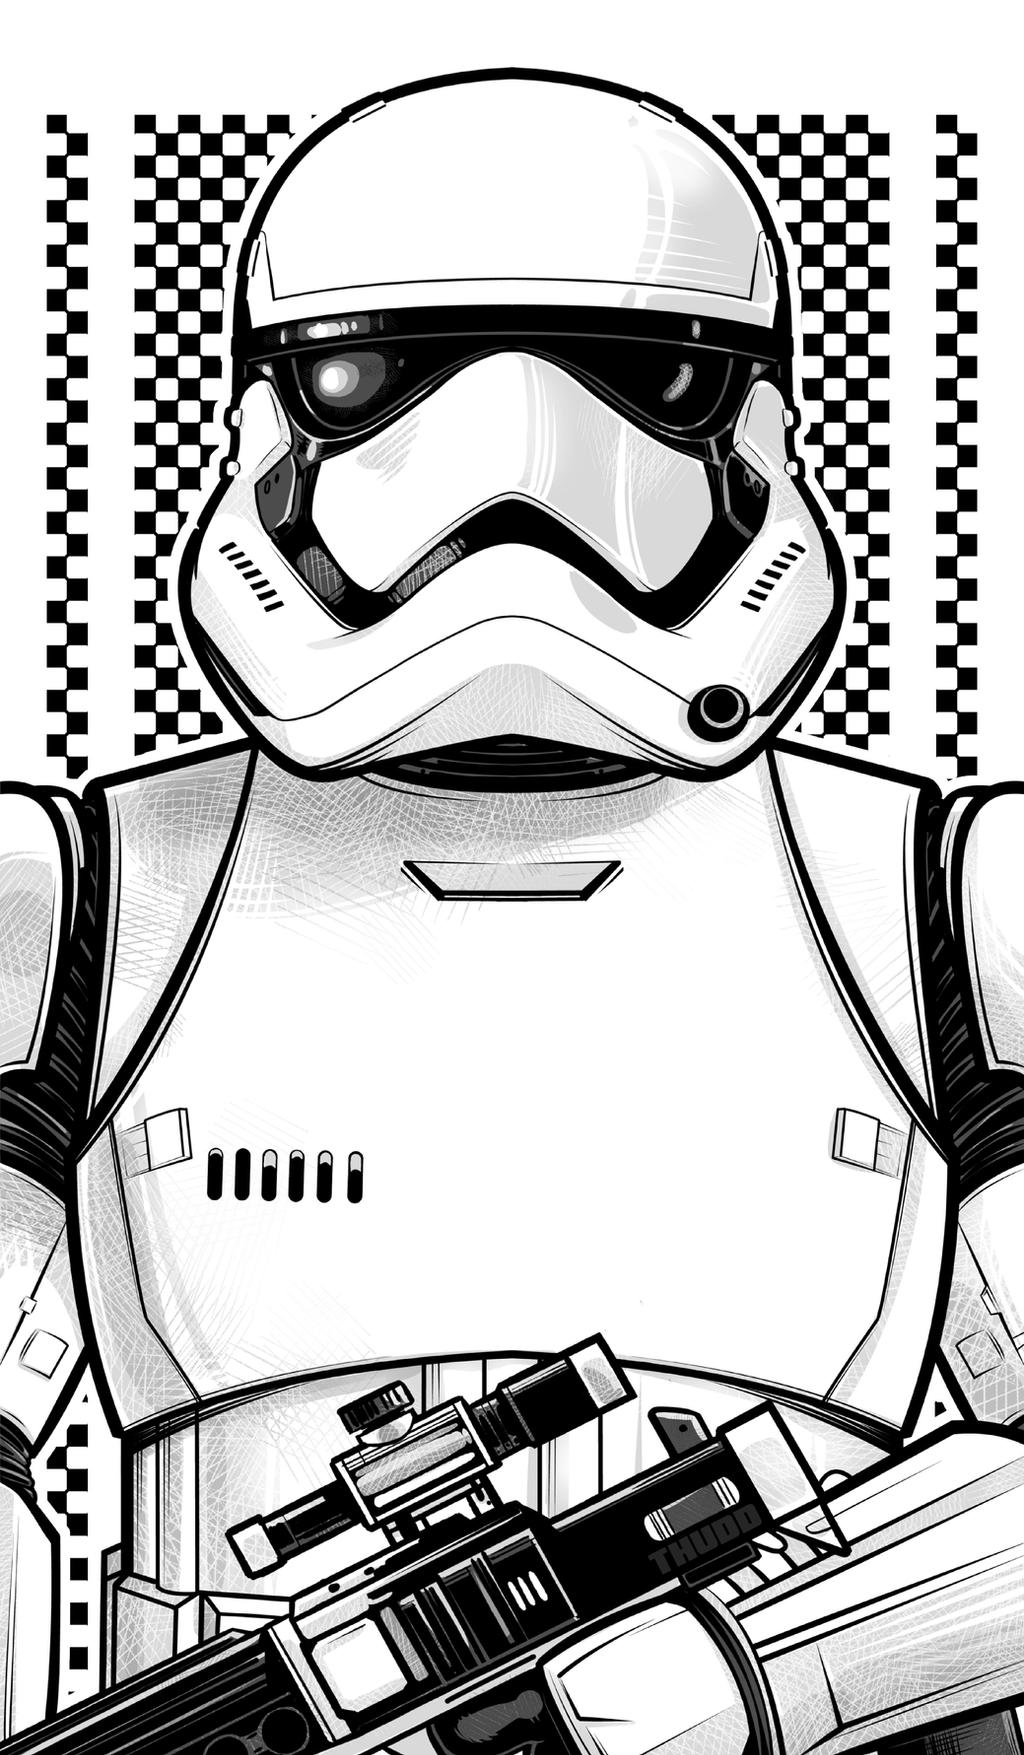 New Stormtrooper by Thuddleston on DeviantArt